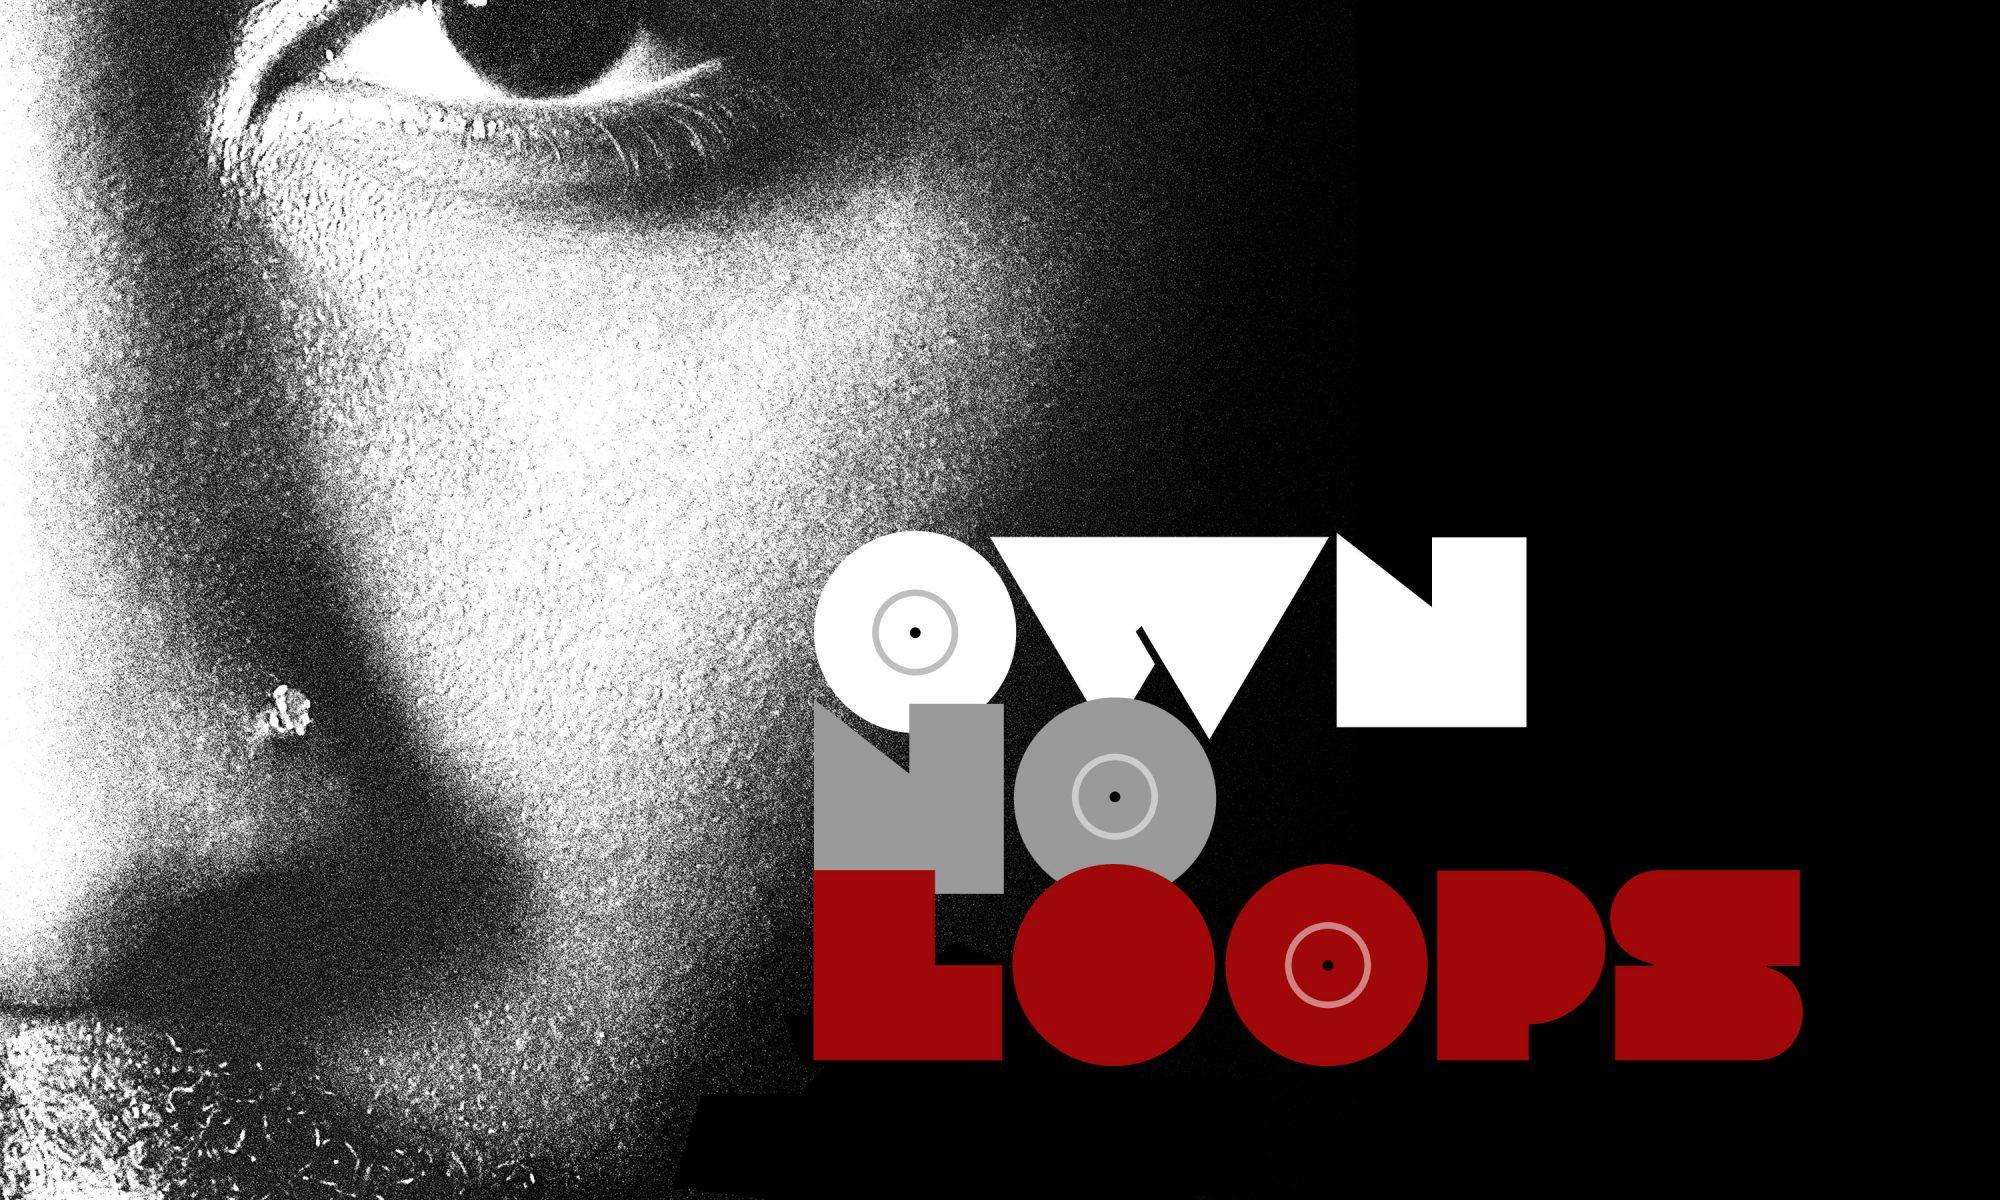 Shout Loops